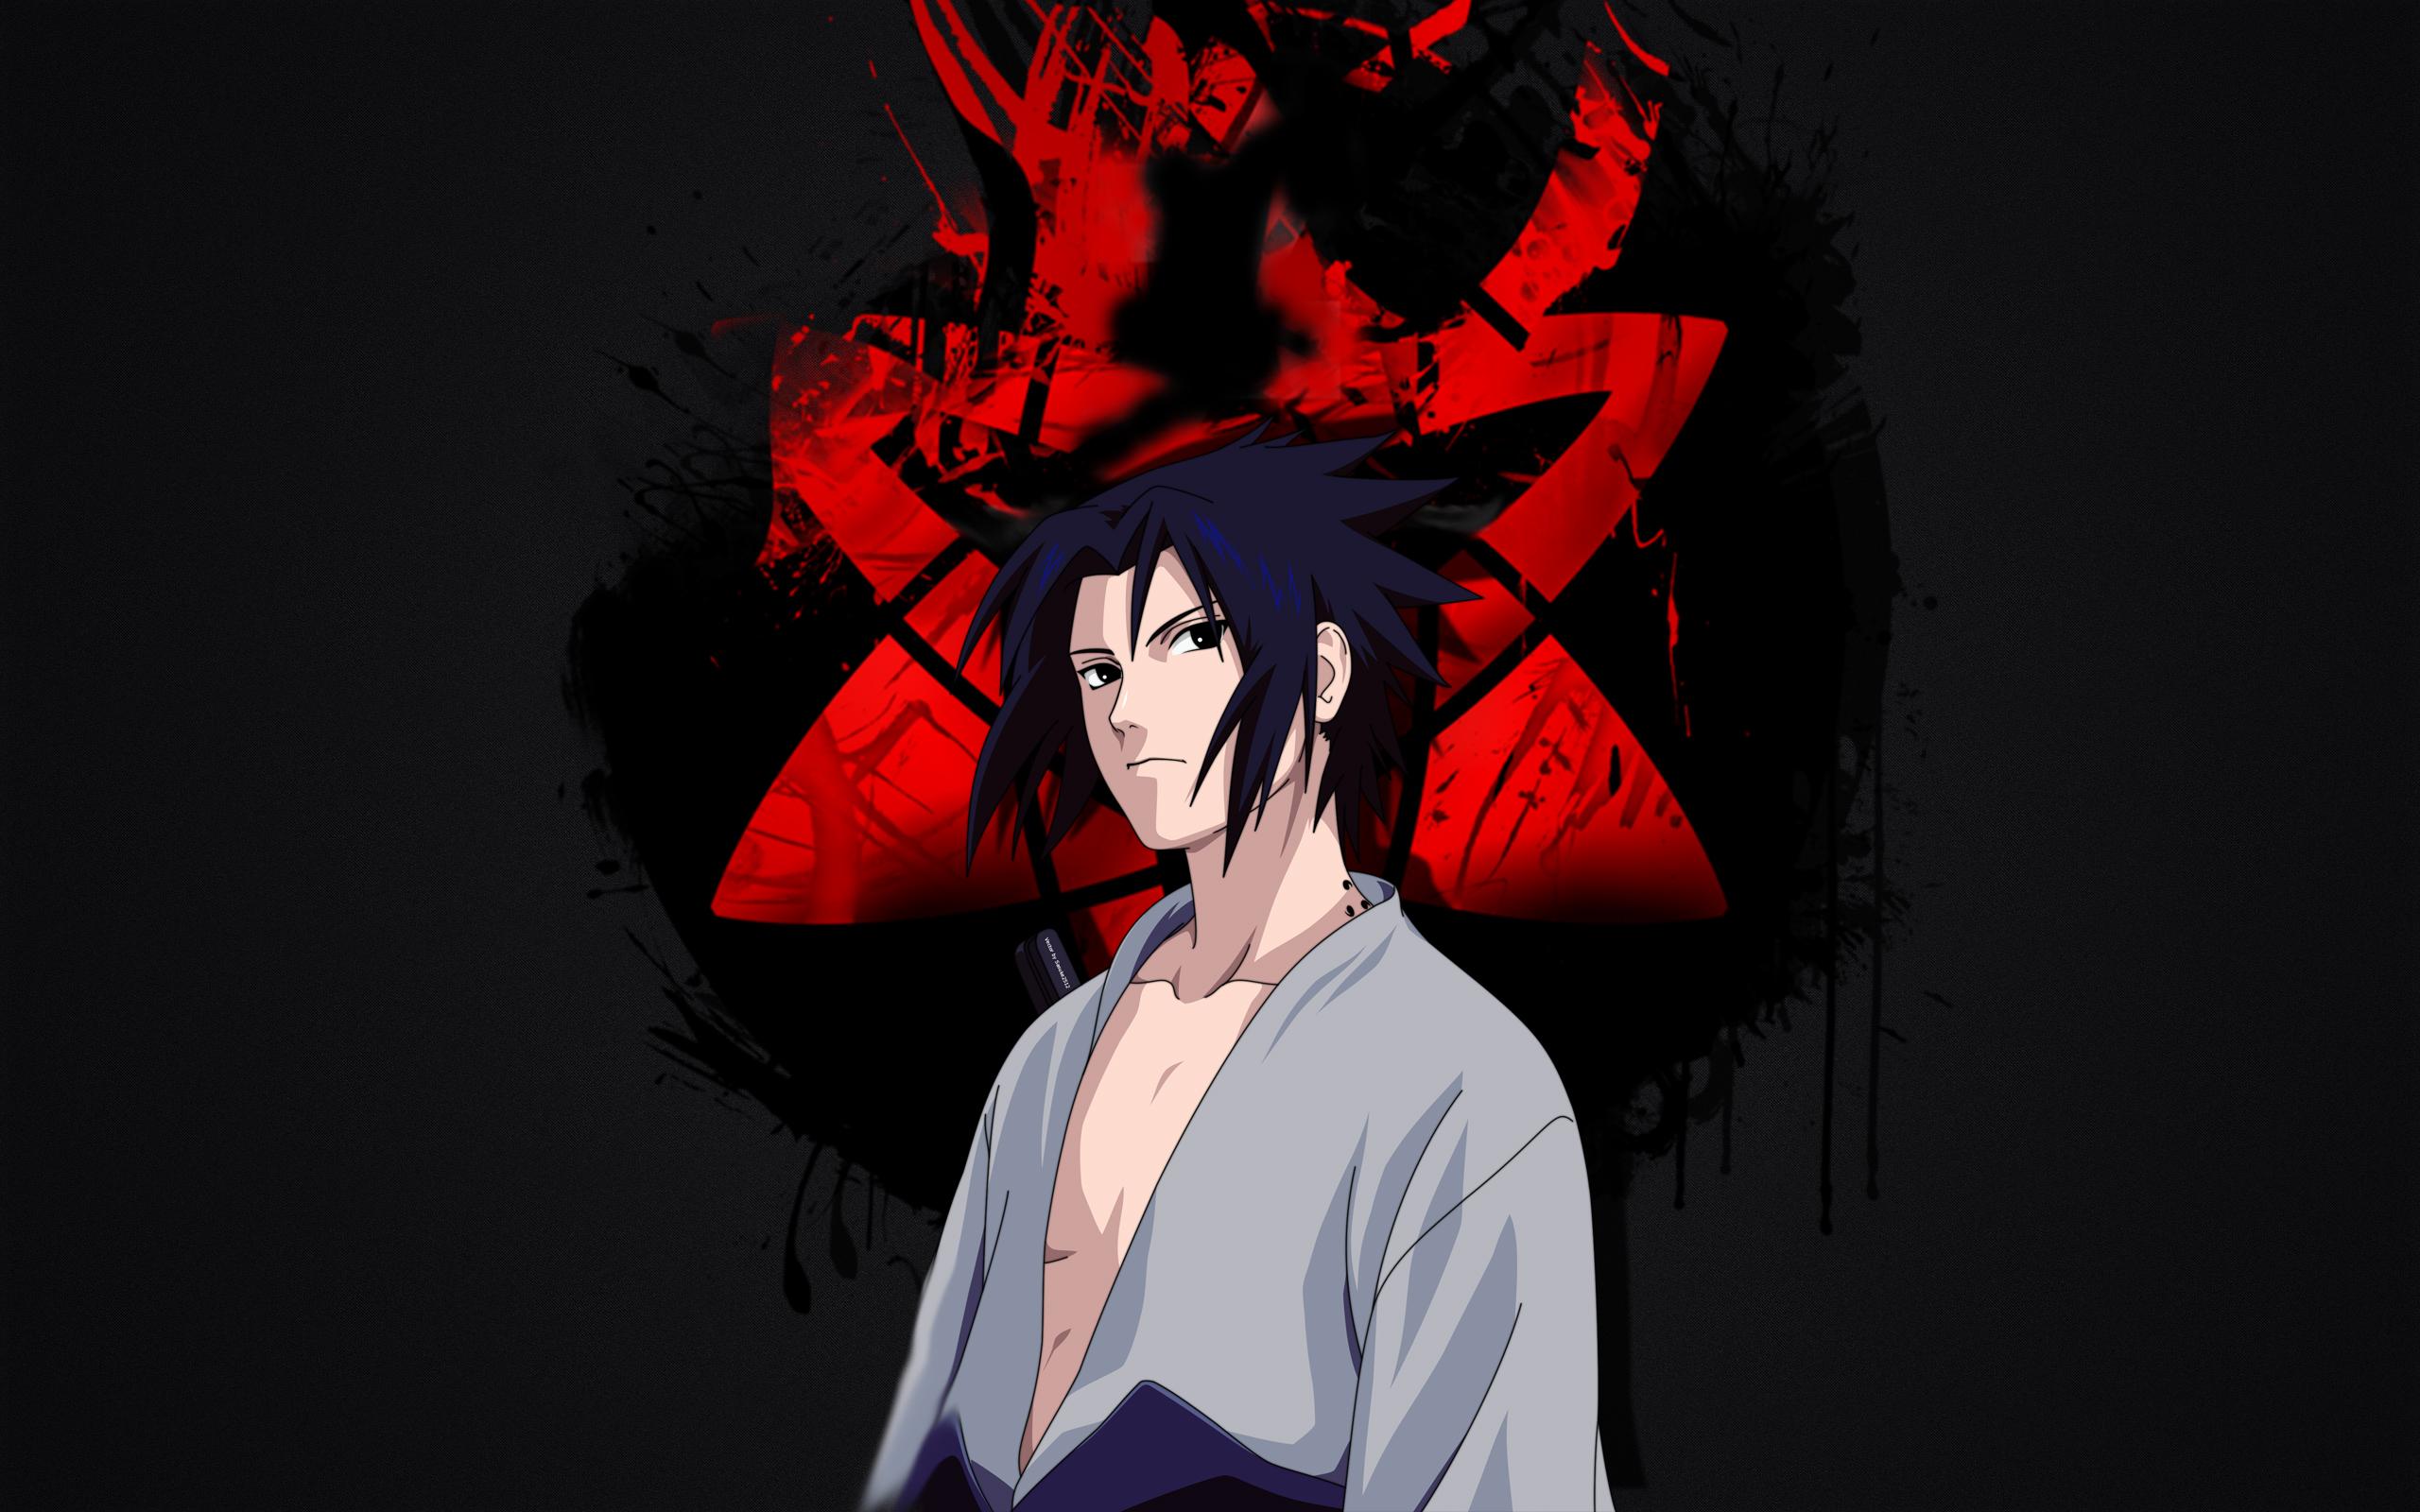 Wallpaper of Anime Naruto Sasuke Uchiha Sharingan